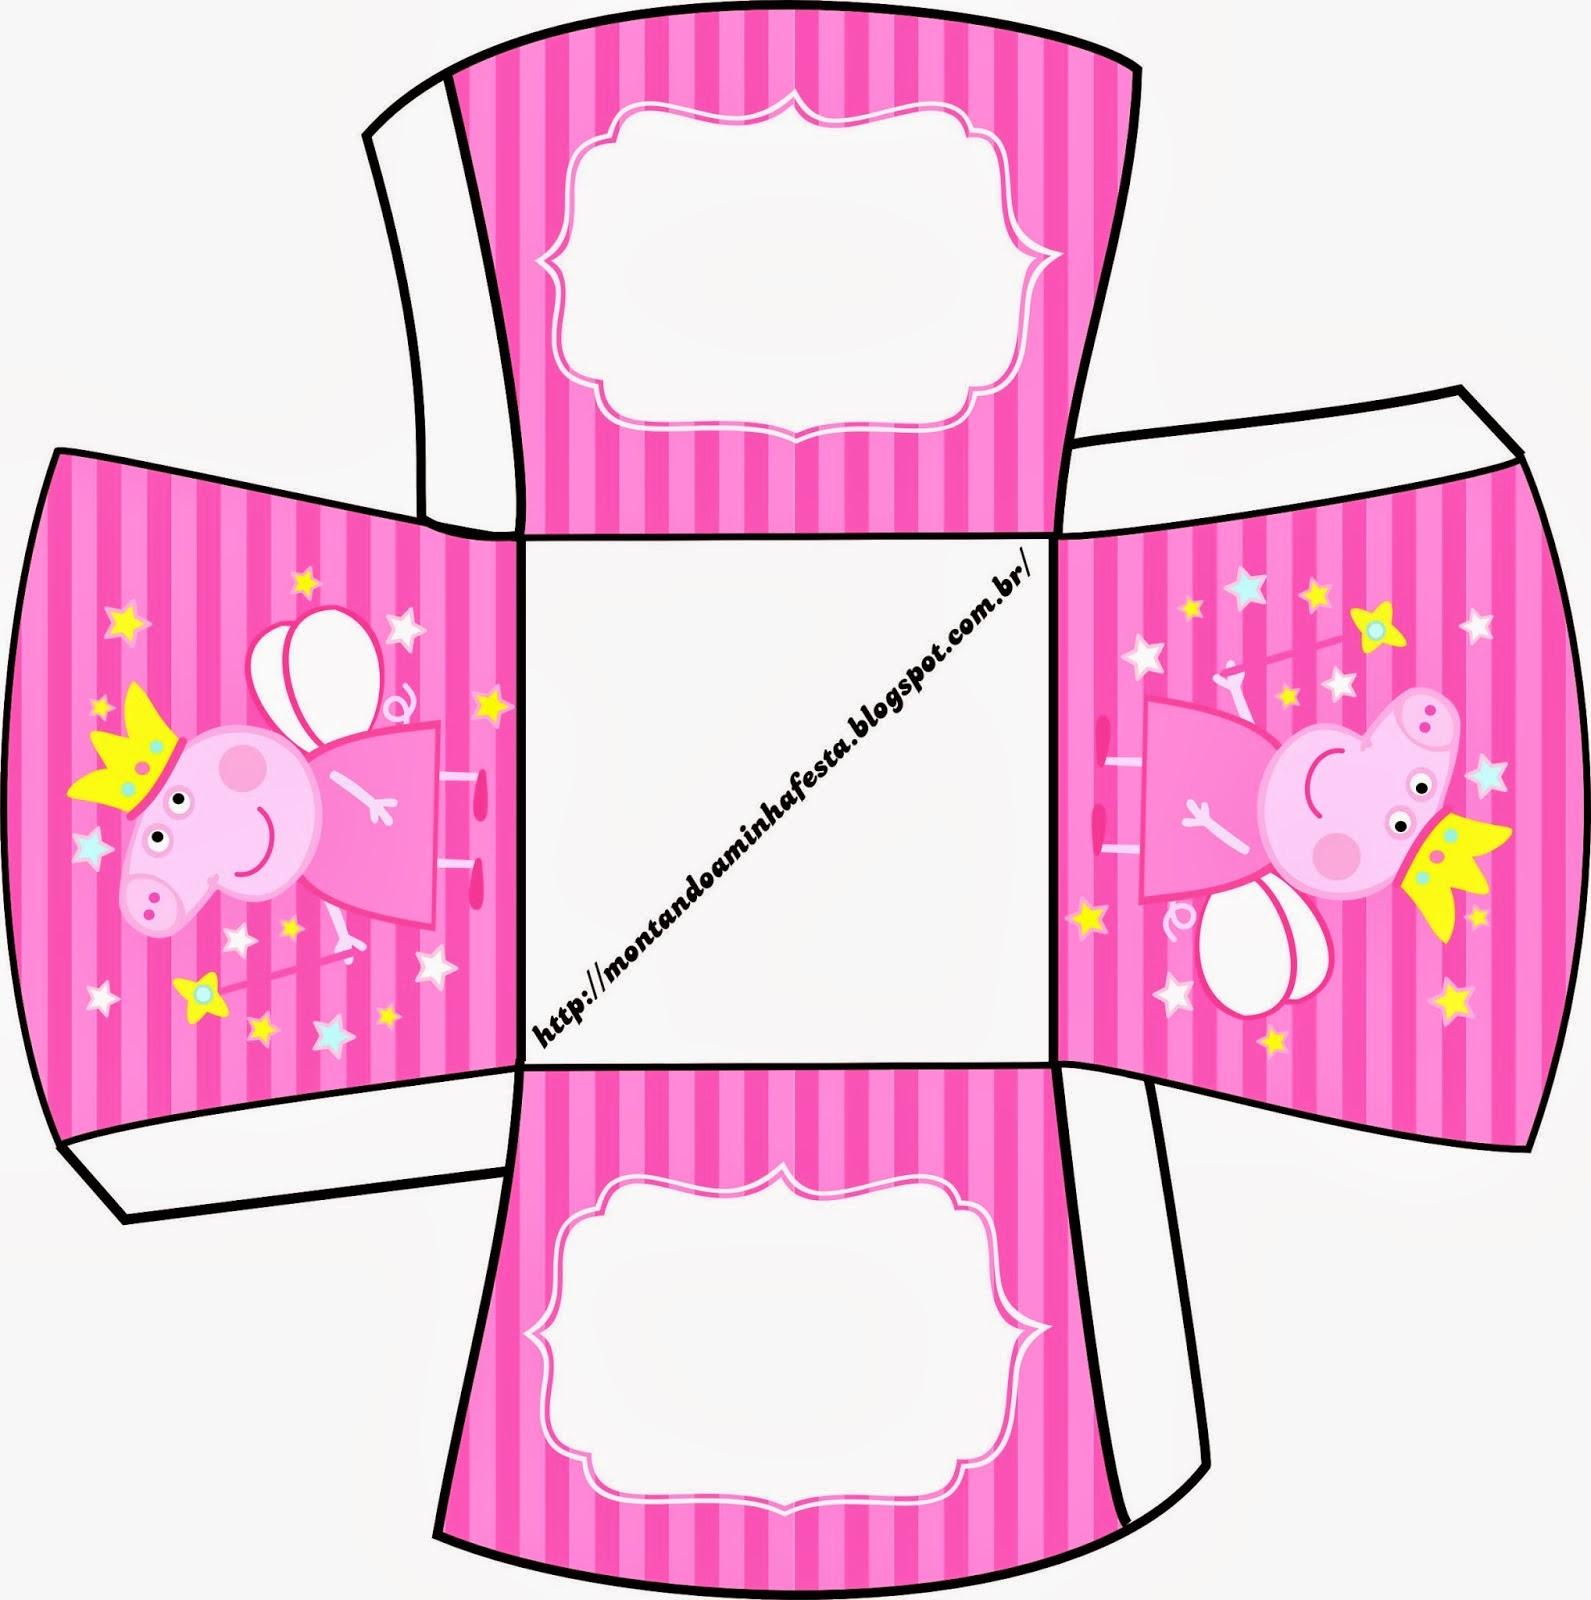 Caja abierta para poner caramelos, chocolates, mazapanes o pastelitos,